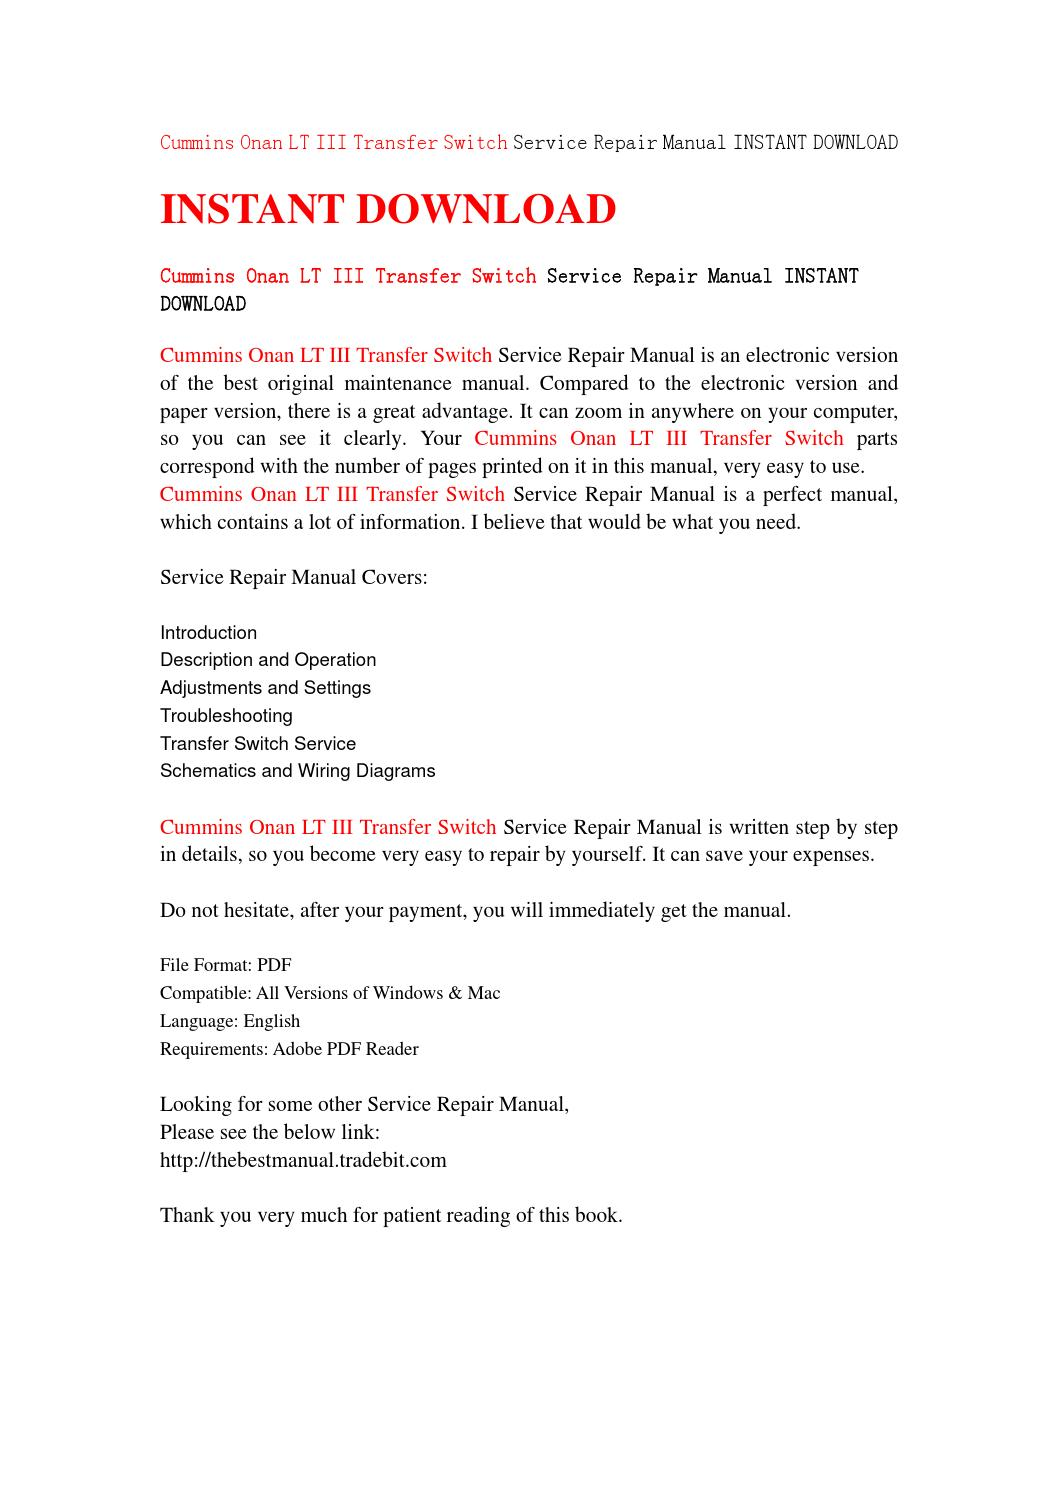 cummins onan lt iii transfer switch service repair manual instant download  by jshjfneh34 - issuu